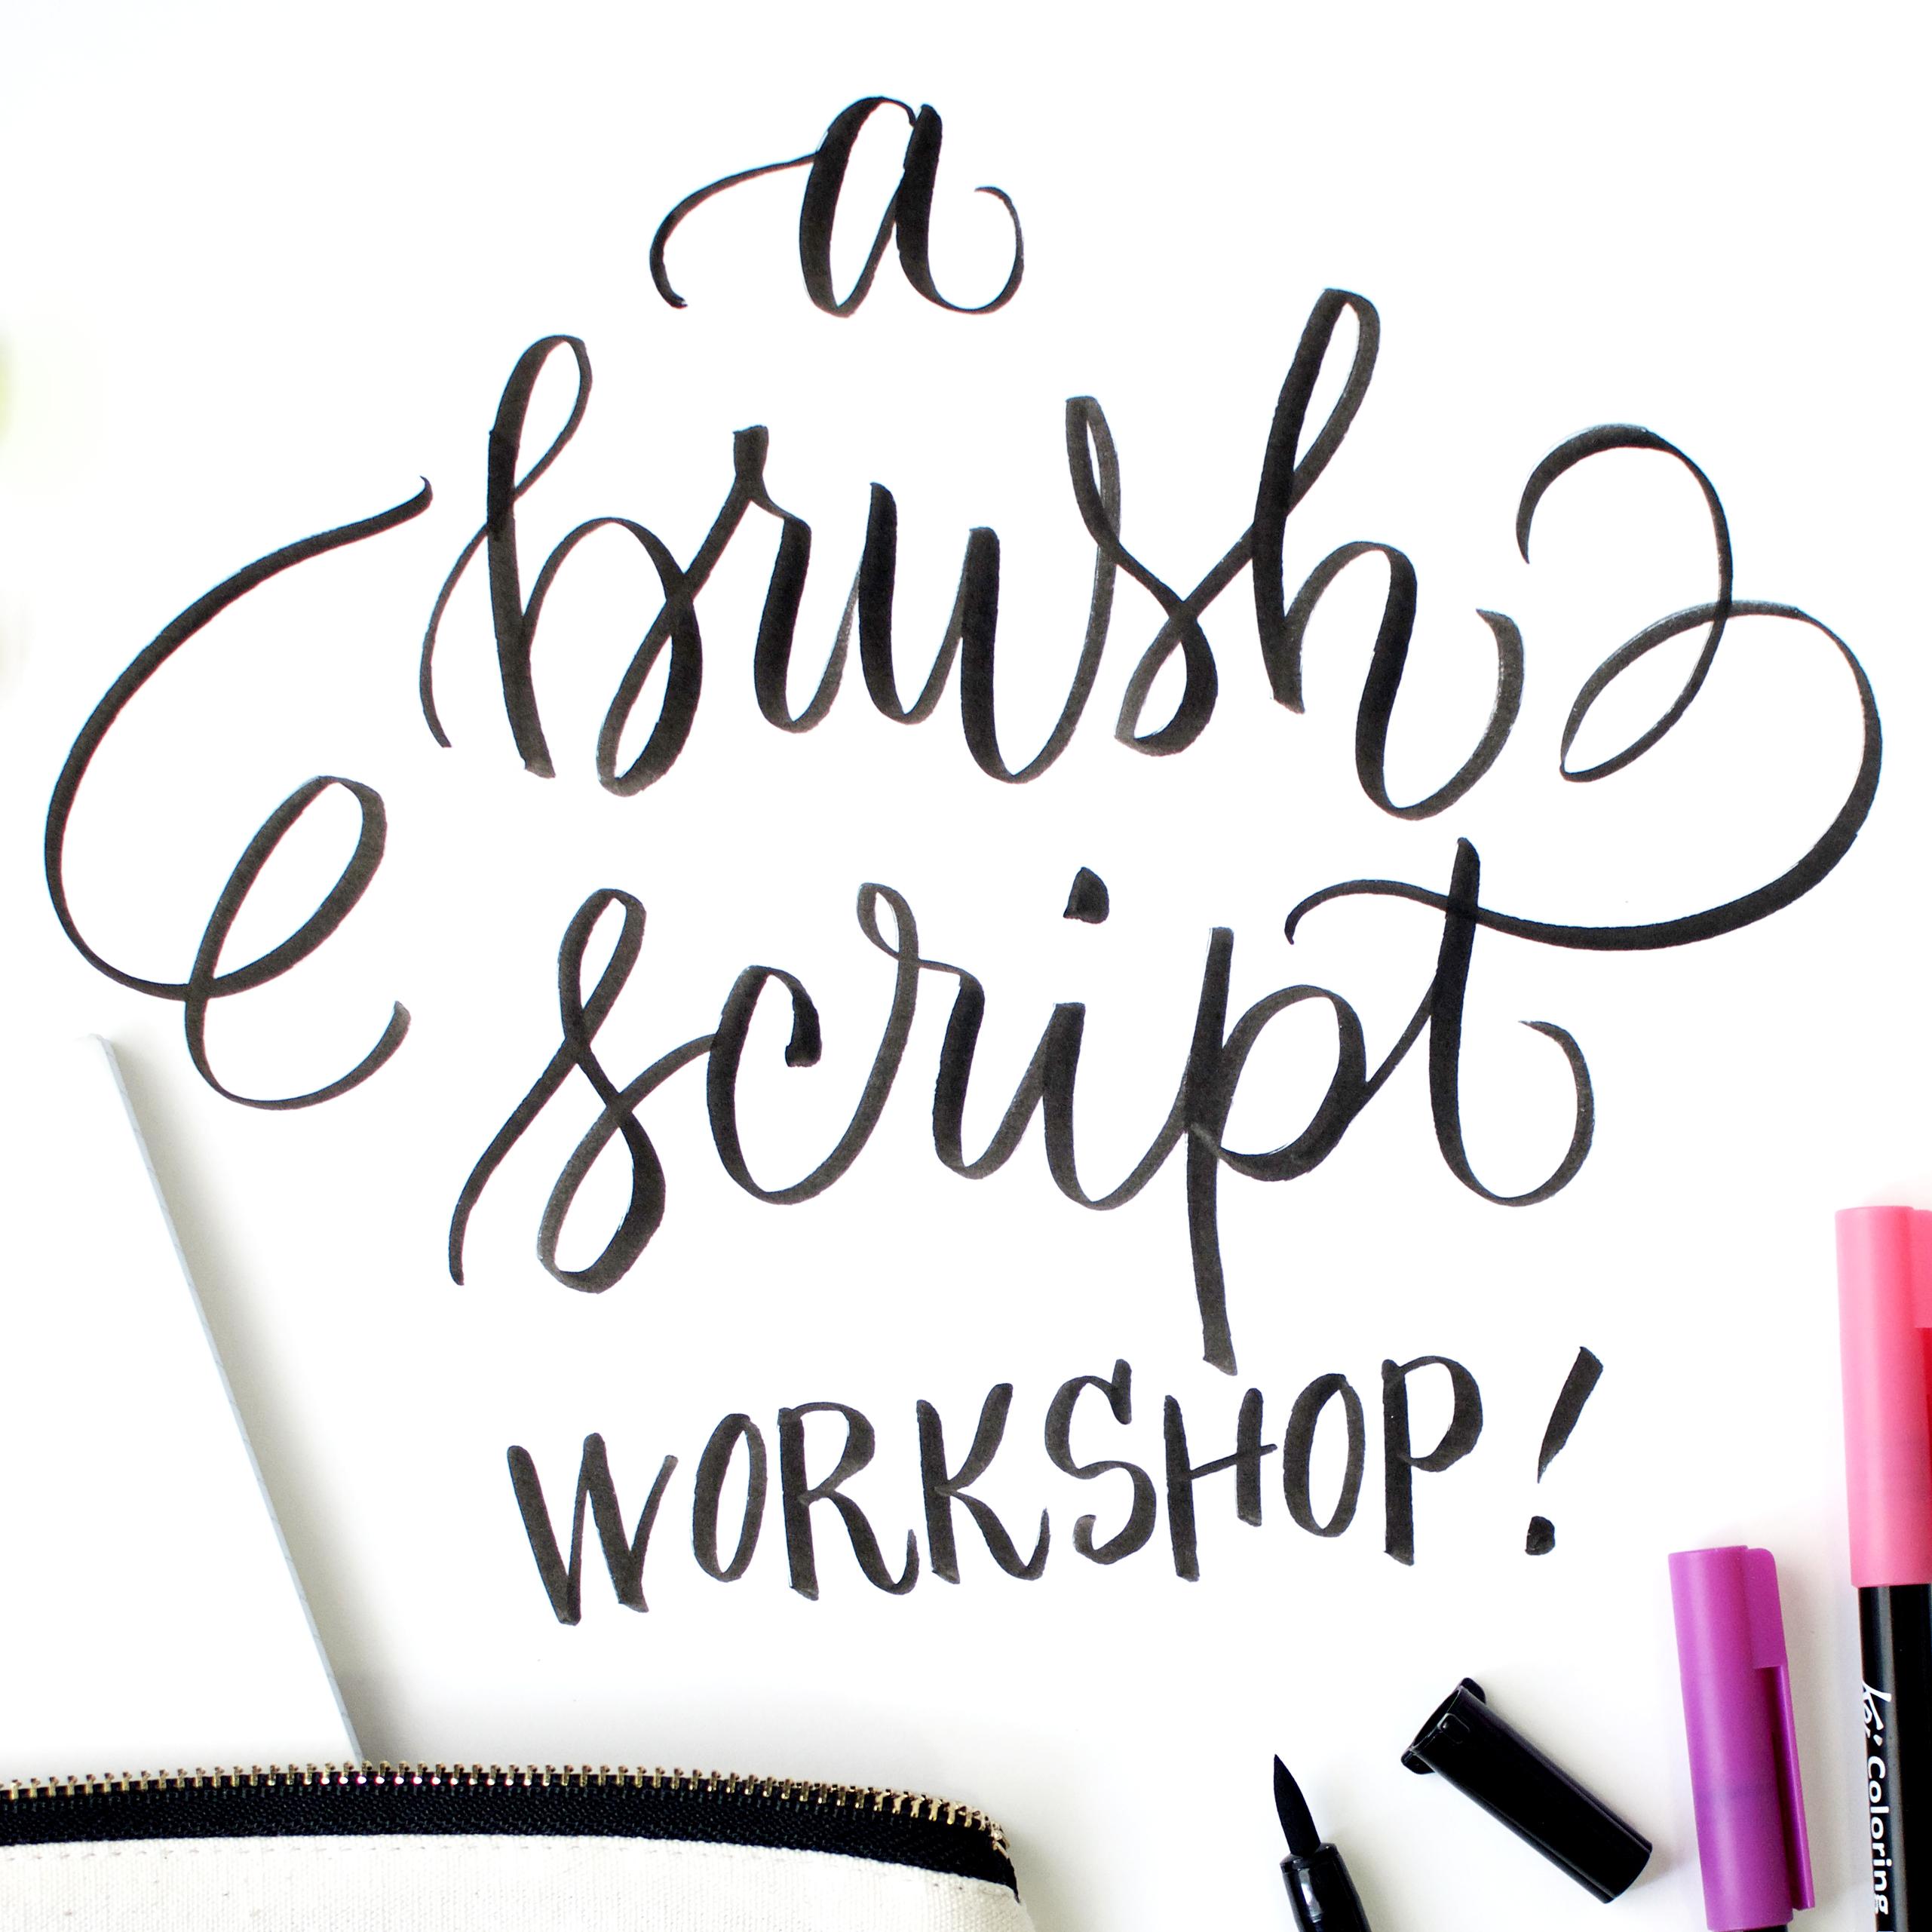 melissaesplin-calligraphy-brush-script-workshop-3